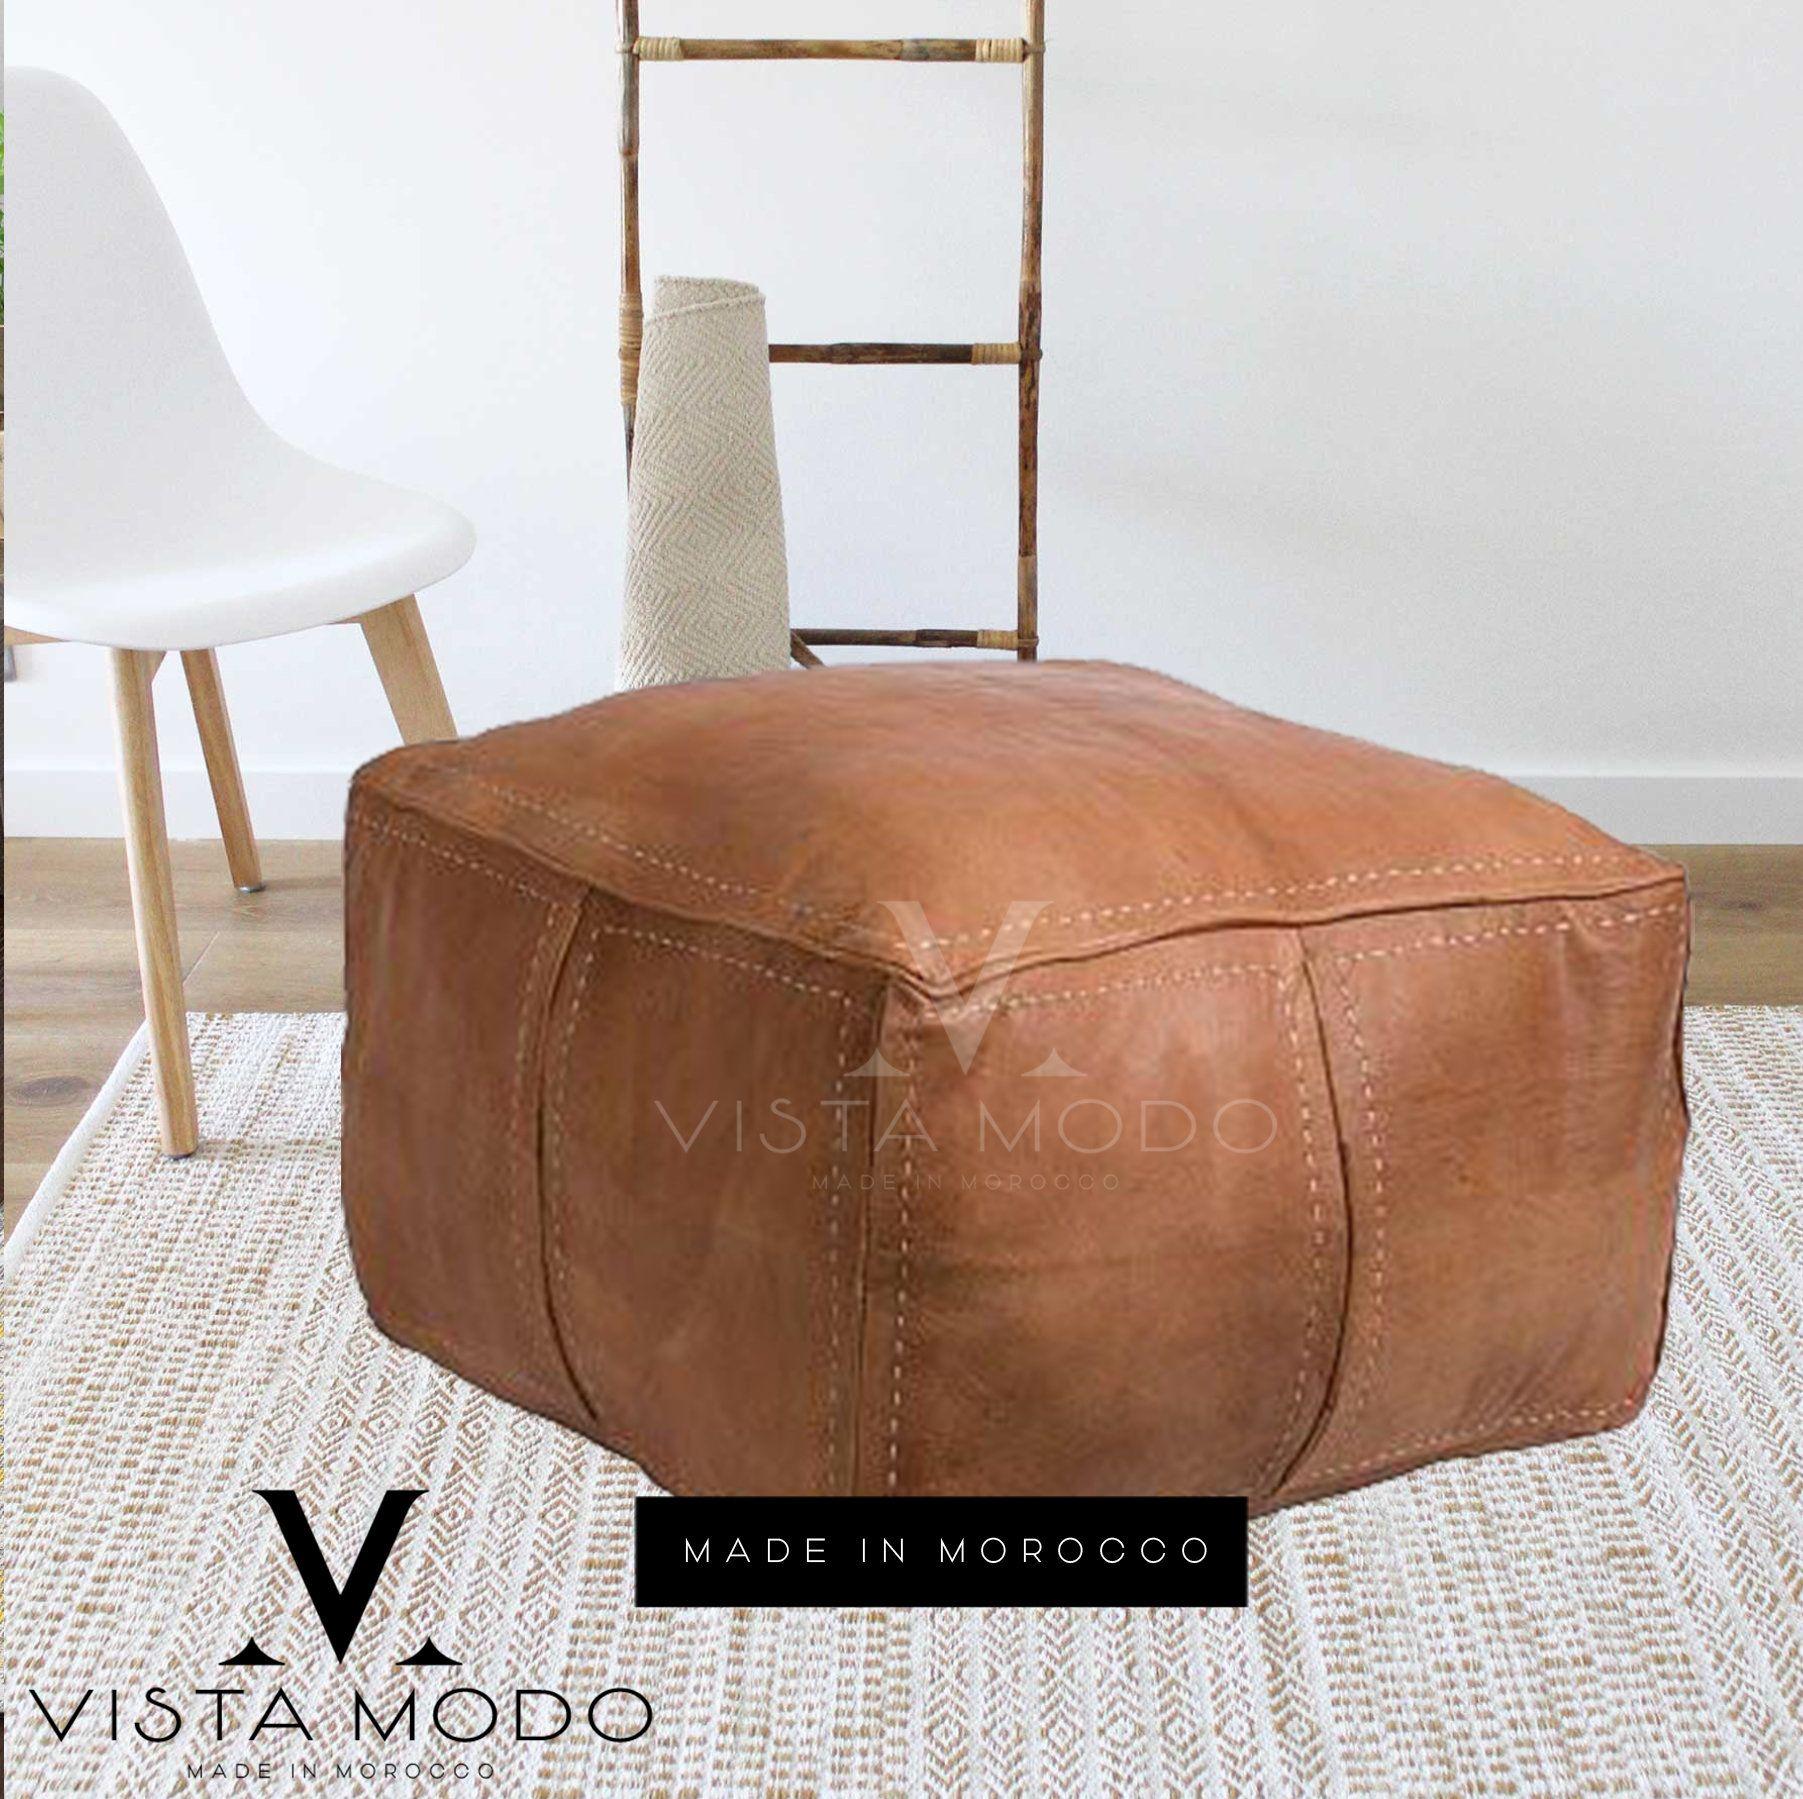 Stuffed Moroccan Pouf Ottoman Floor Leather Luxury Etsy In 2020